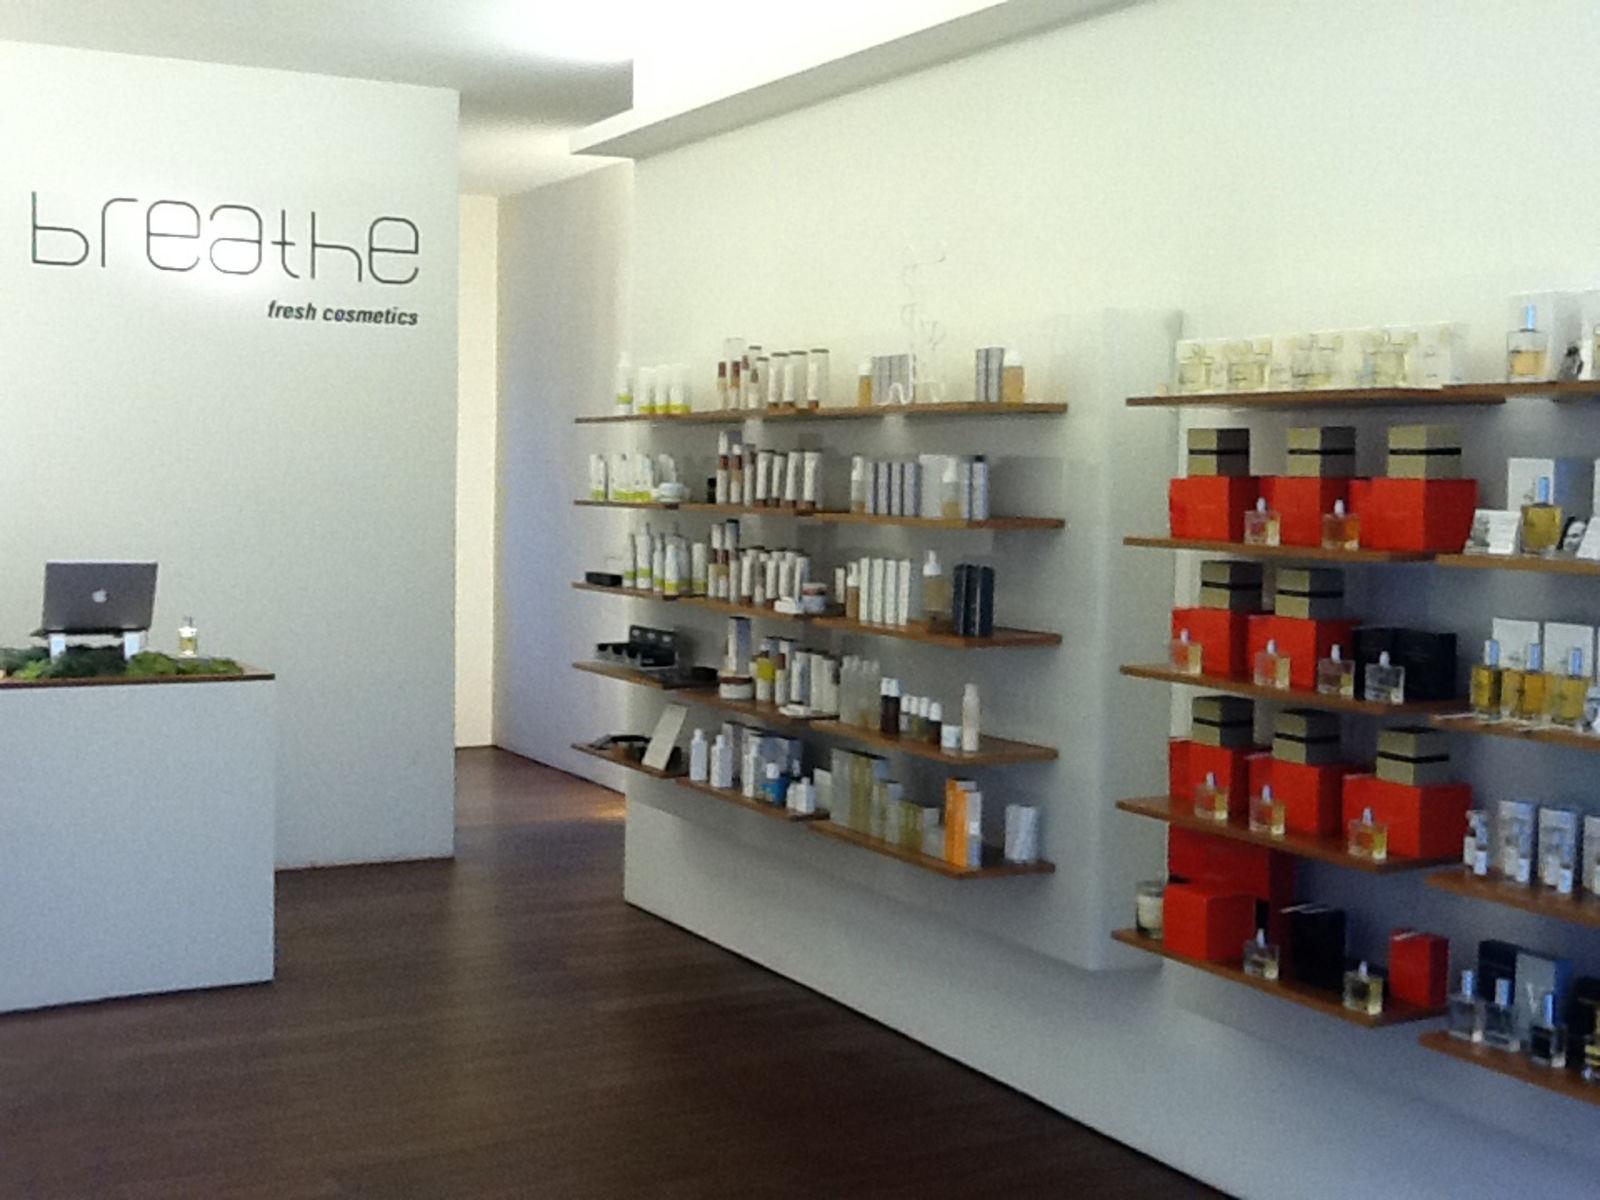 BREATHE fresh cosmetics in Berlin (Bild 2)